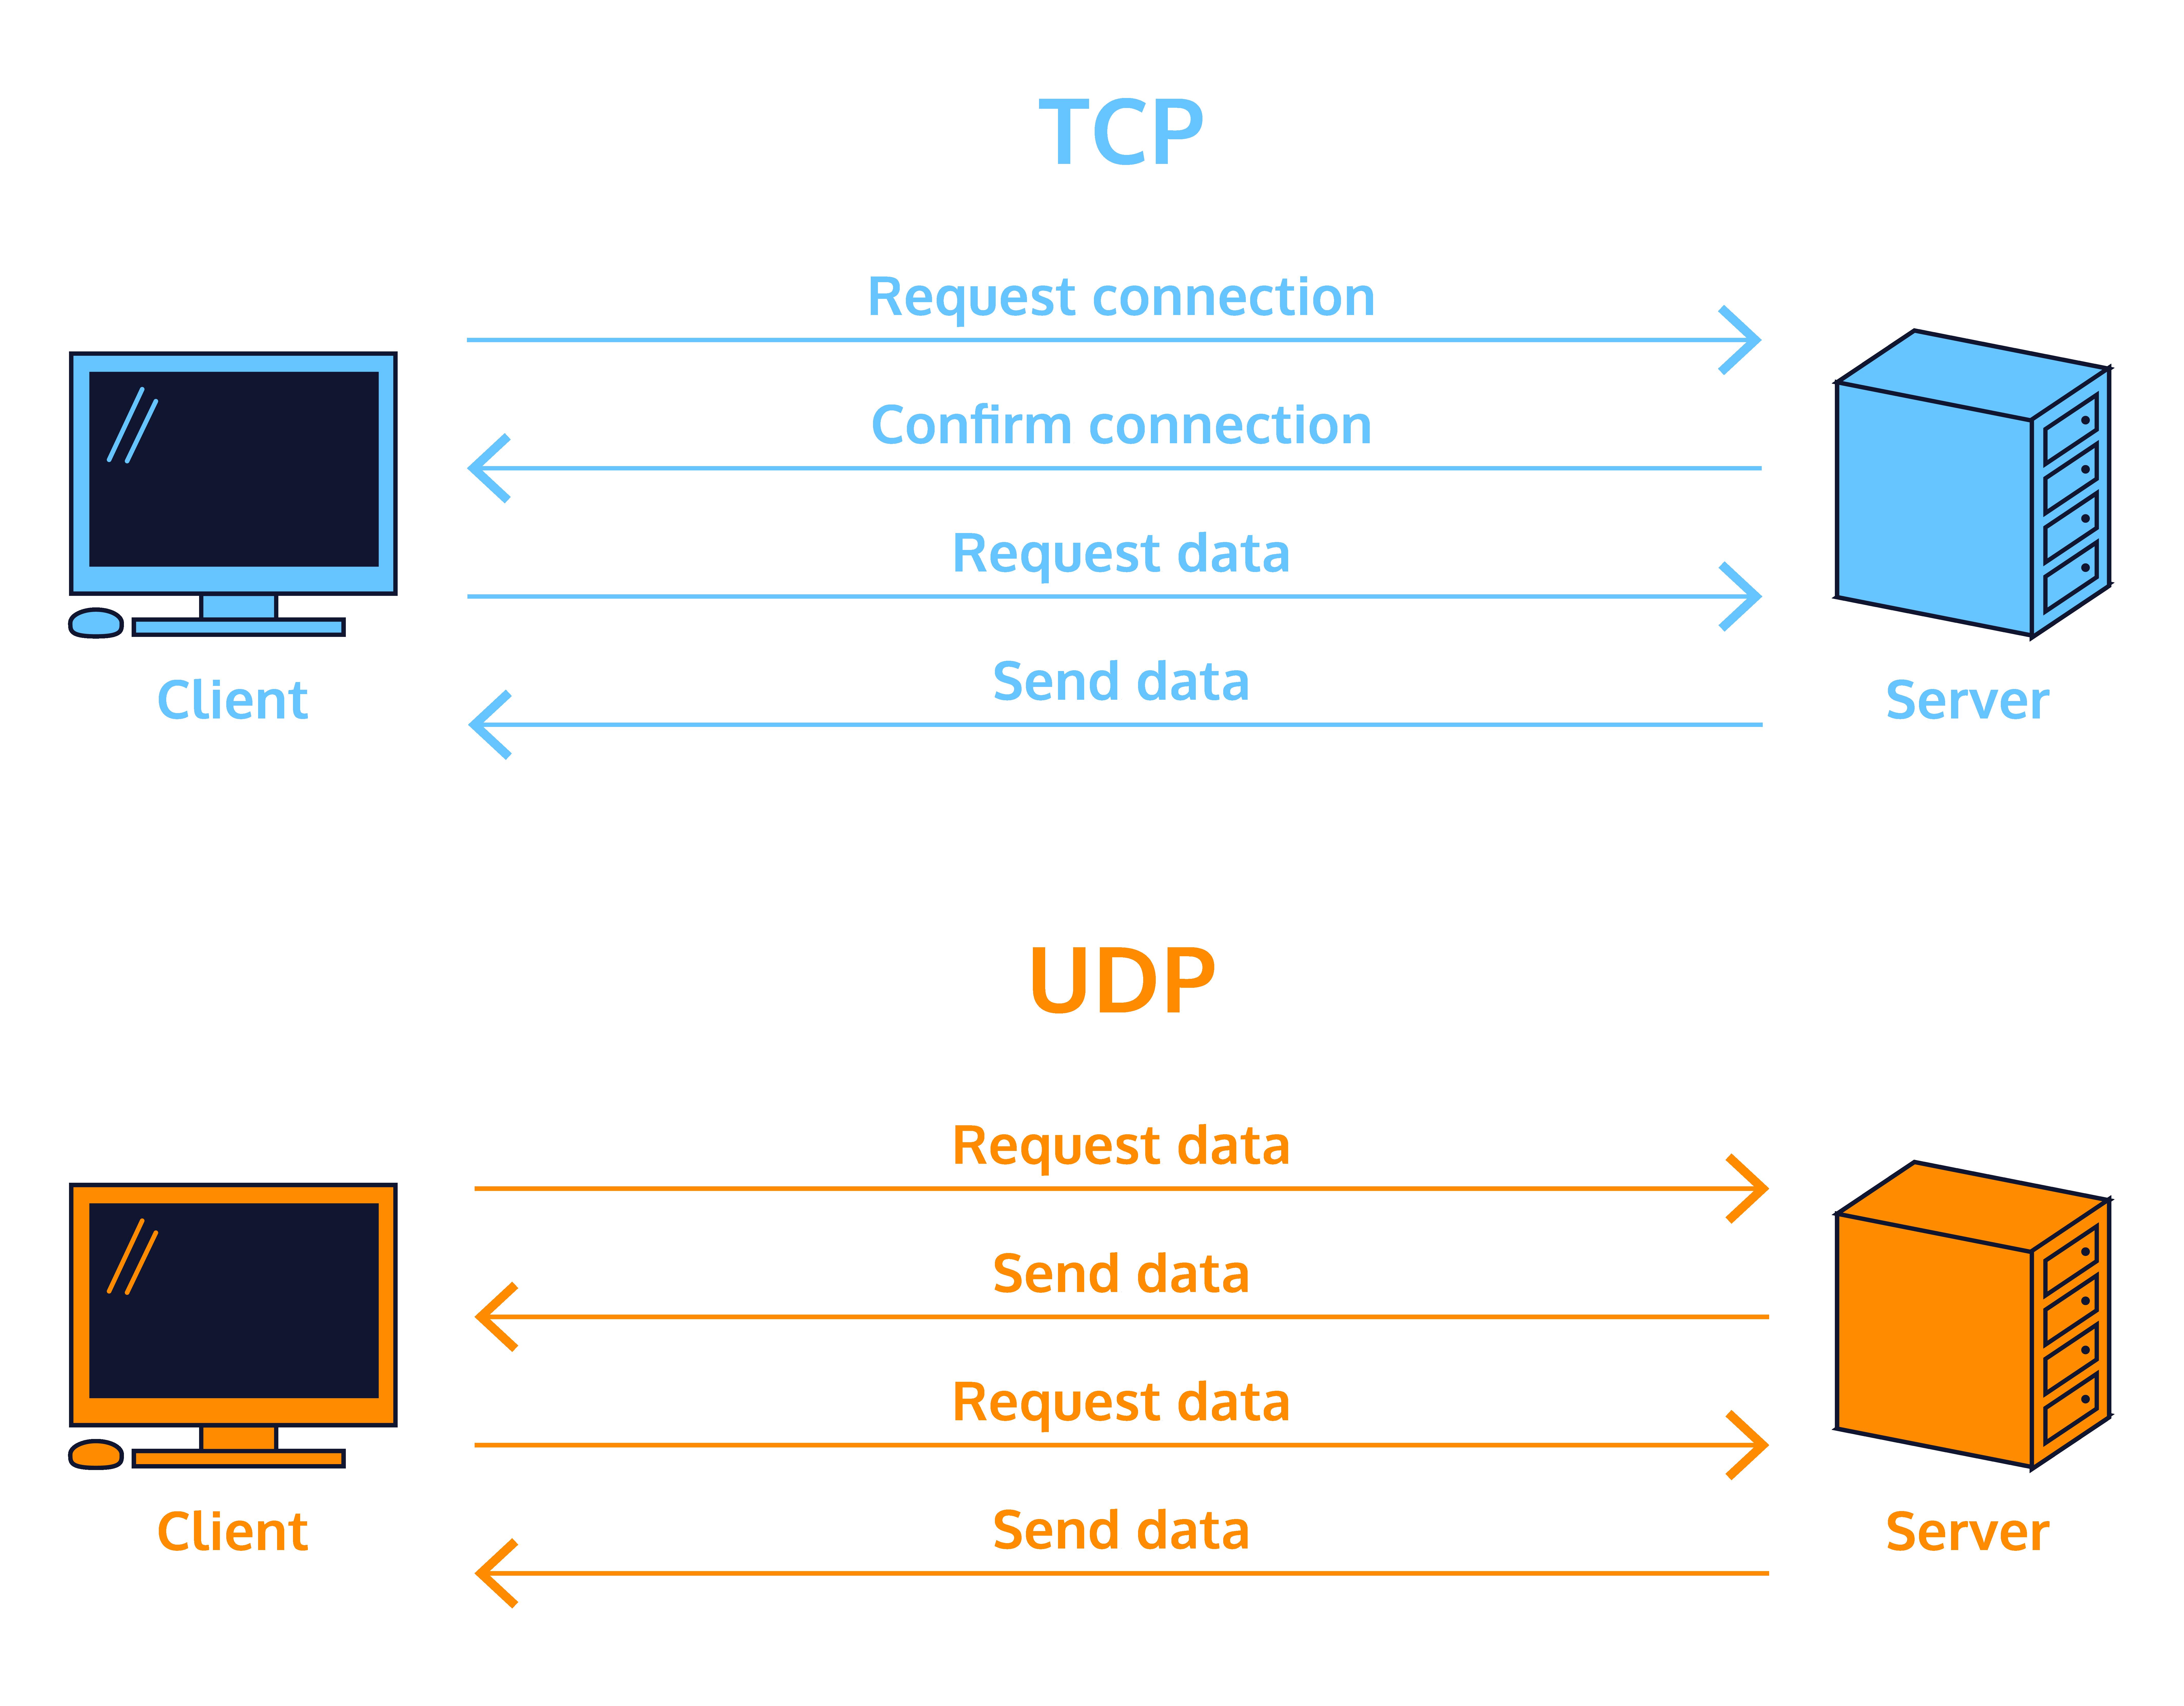 A diagram that compares data flow in TCP versus UDP.